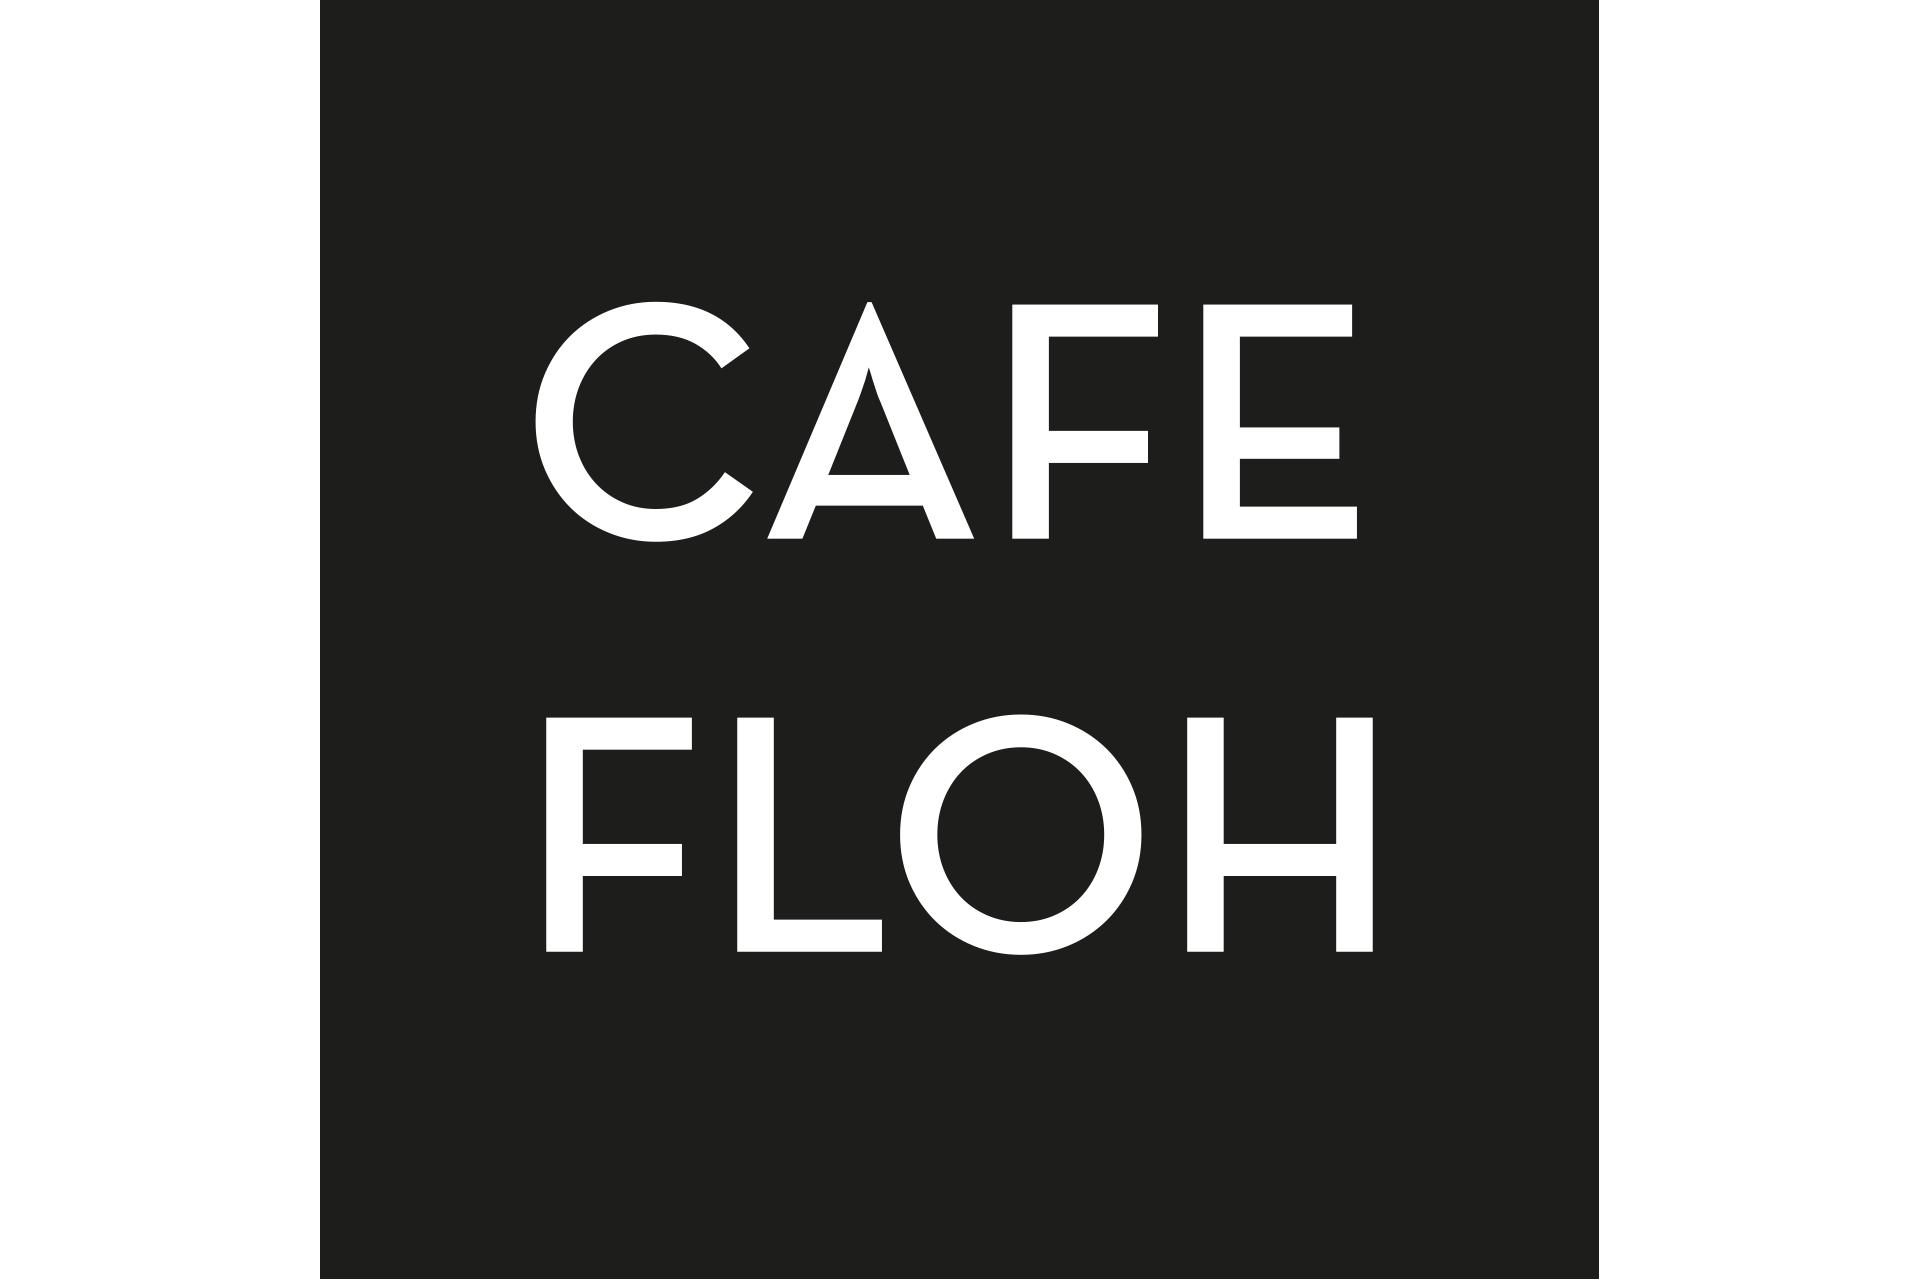 Logo CAFE FLOH